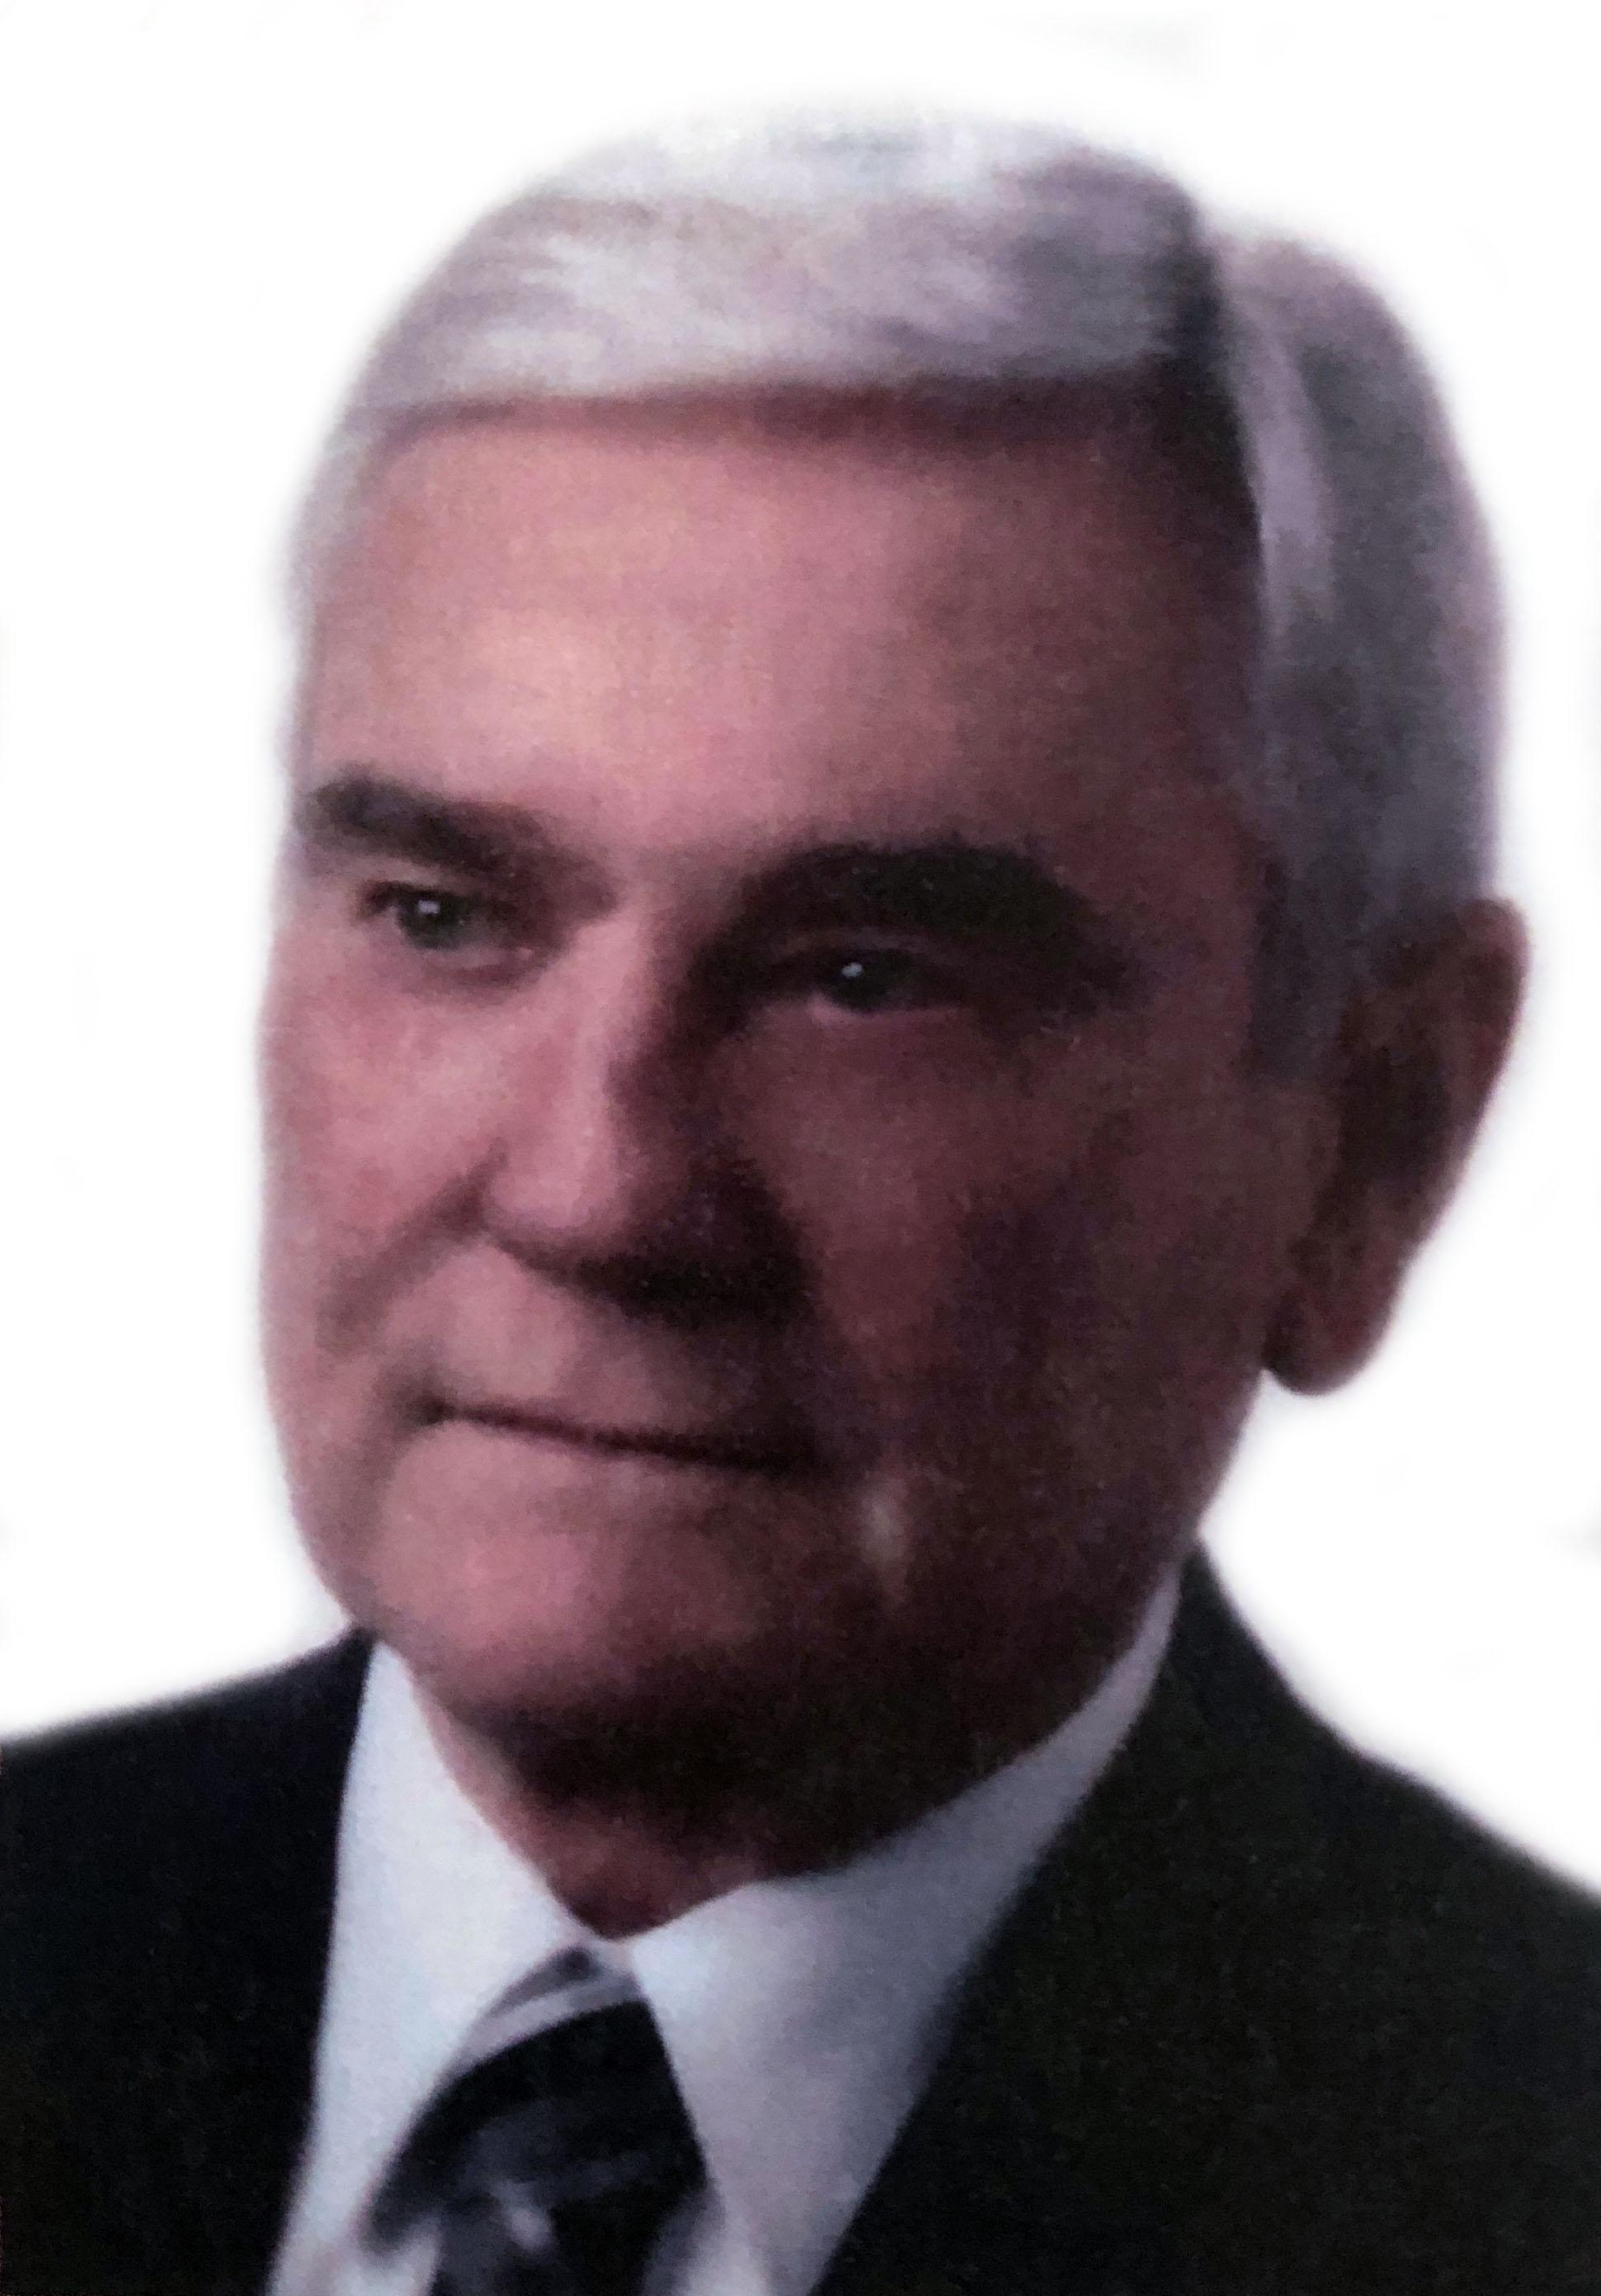 Rev. Arthur Slye - Founding General Superintendent of the Bethel Methodist Denomination